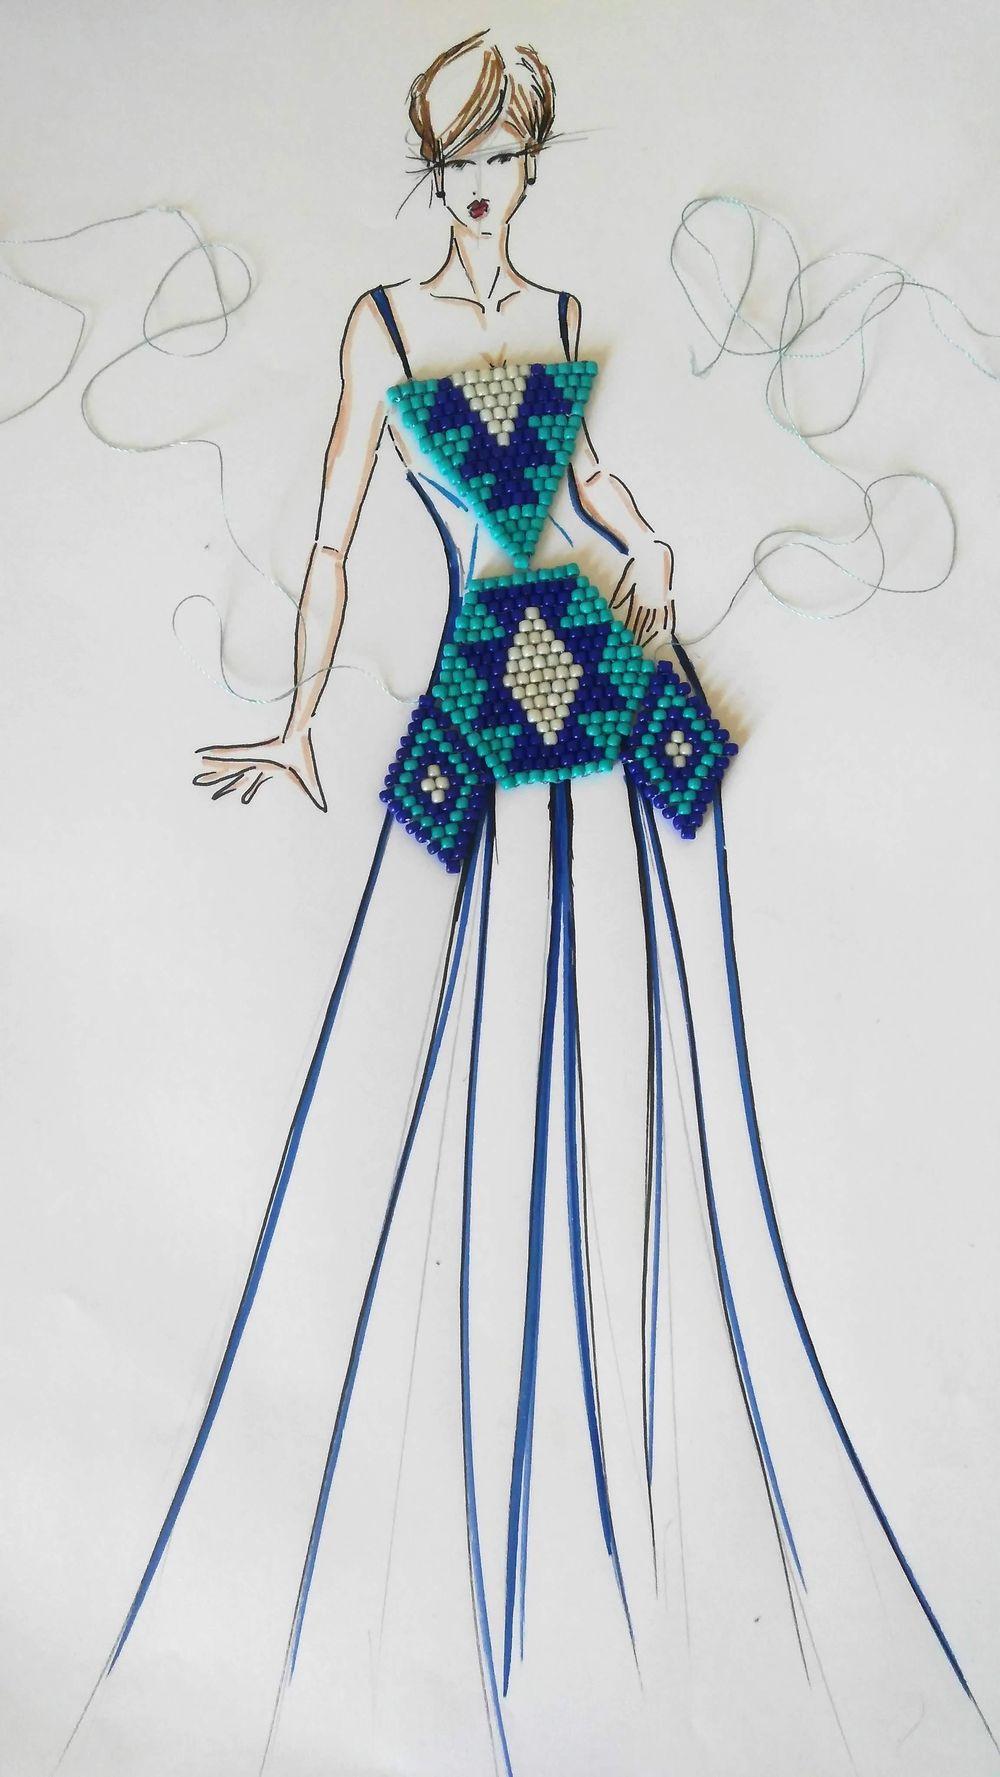 Beaded fashion illustration - image 1 - student project